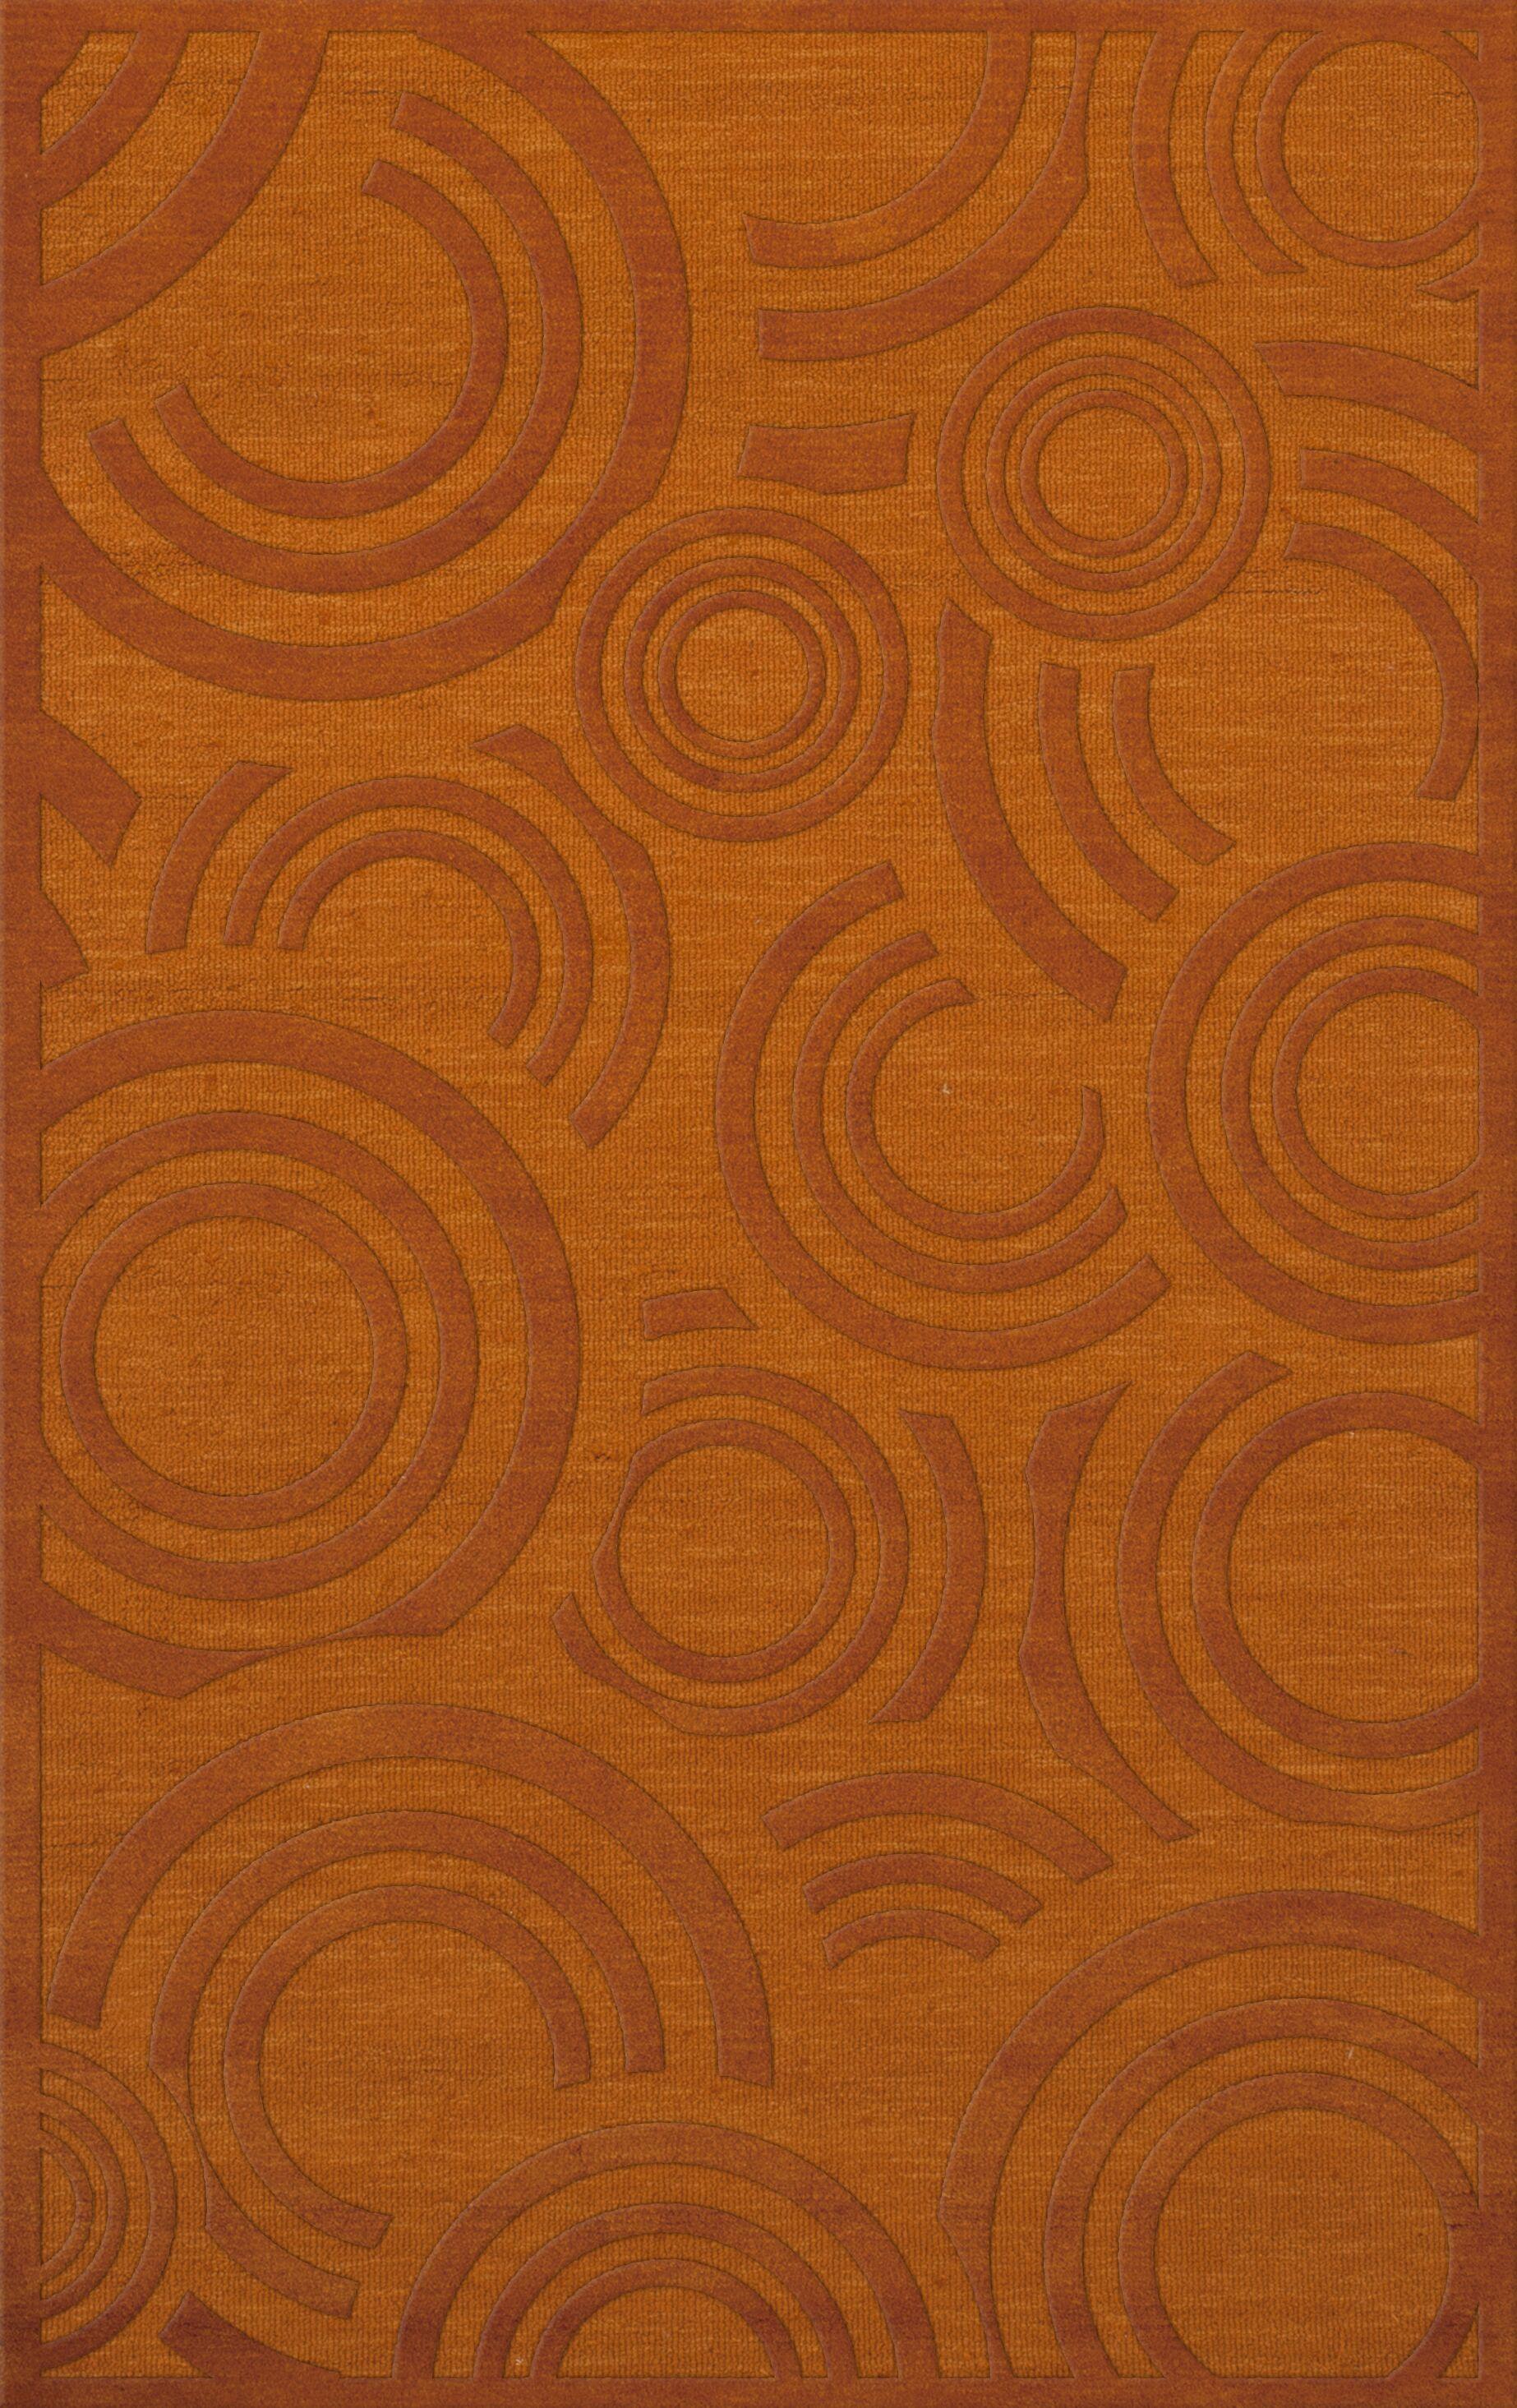 Dover Tufted Wool Orange Area Rug Rug Size: Rectangle 6' x 9'